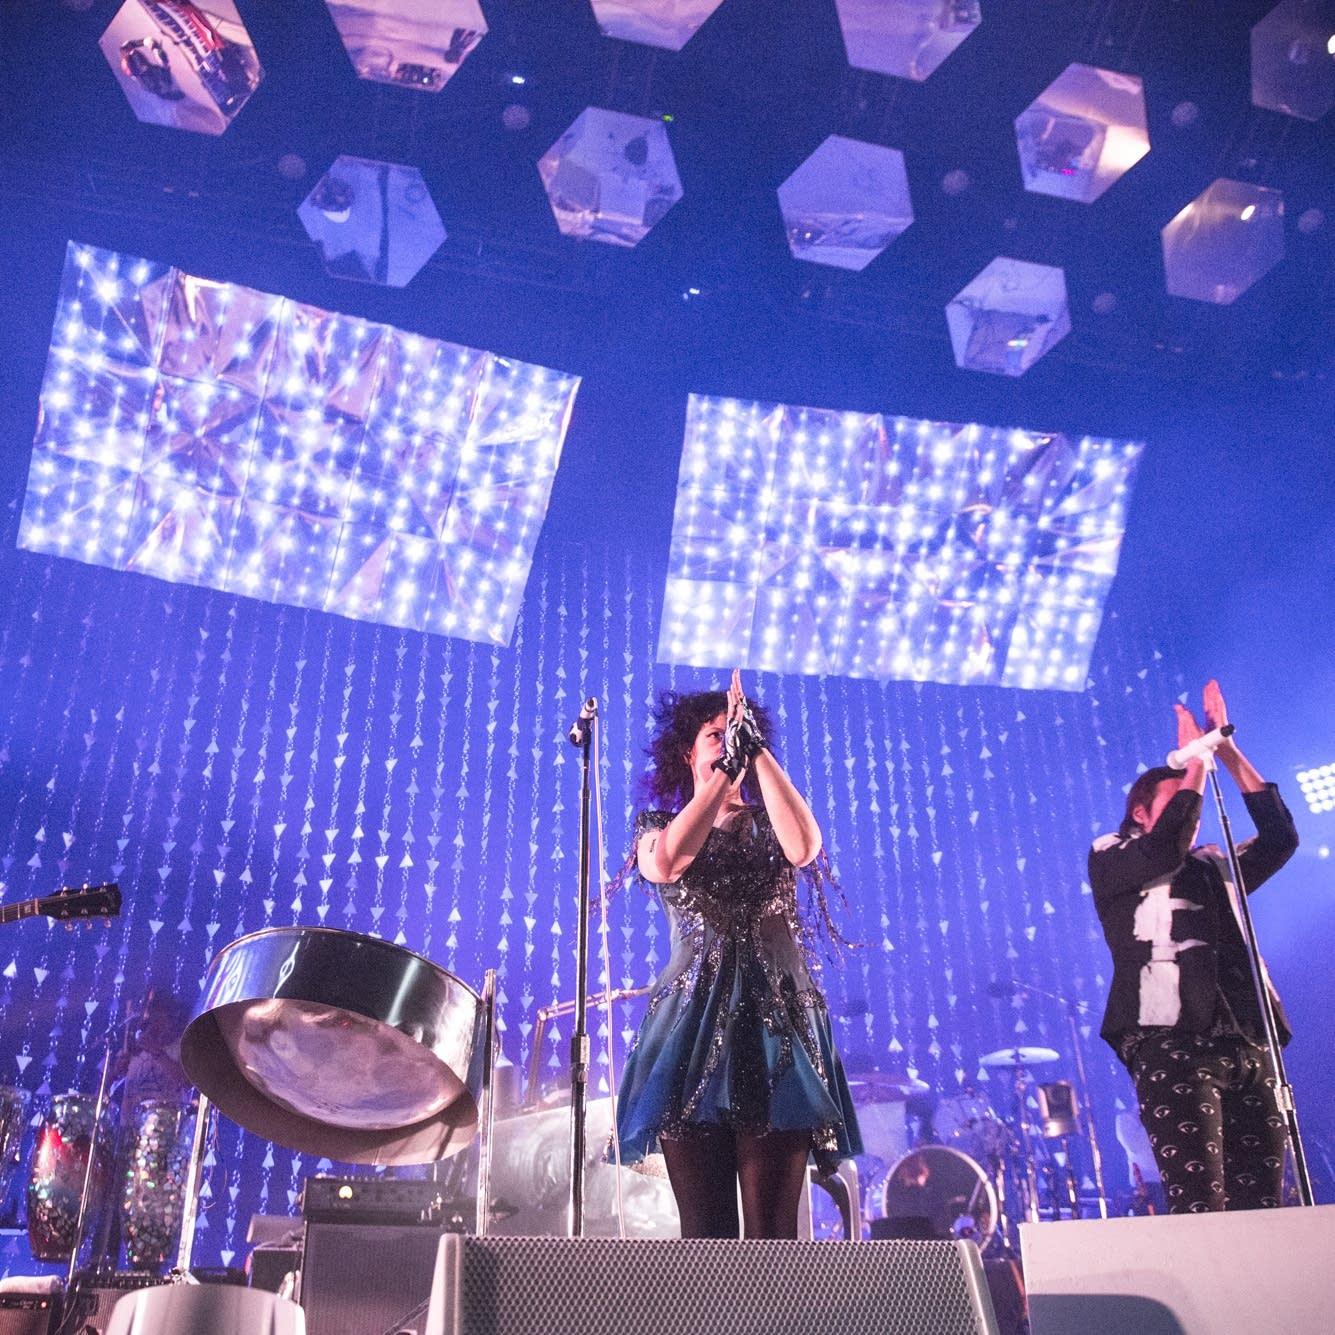 Arcade Fire applauds the audience